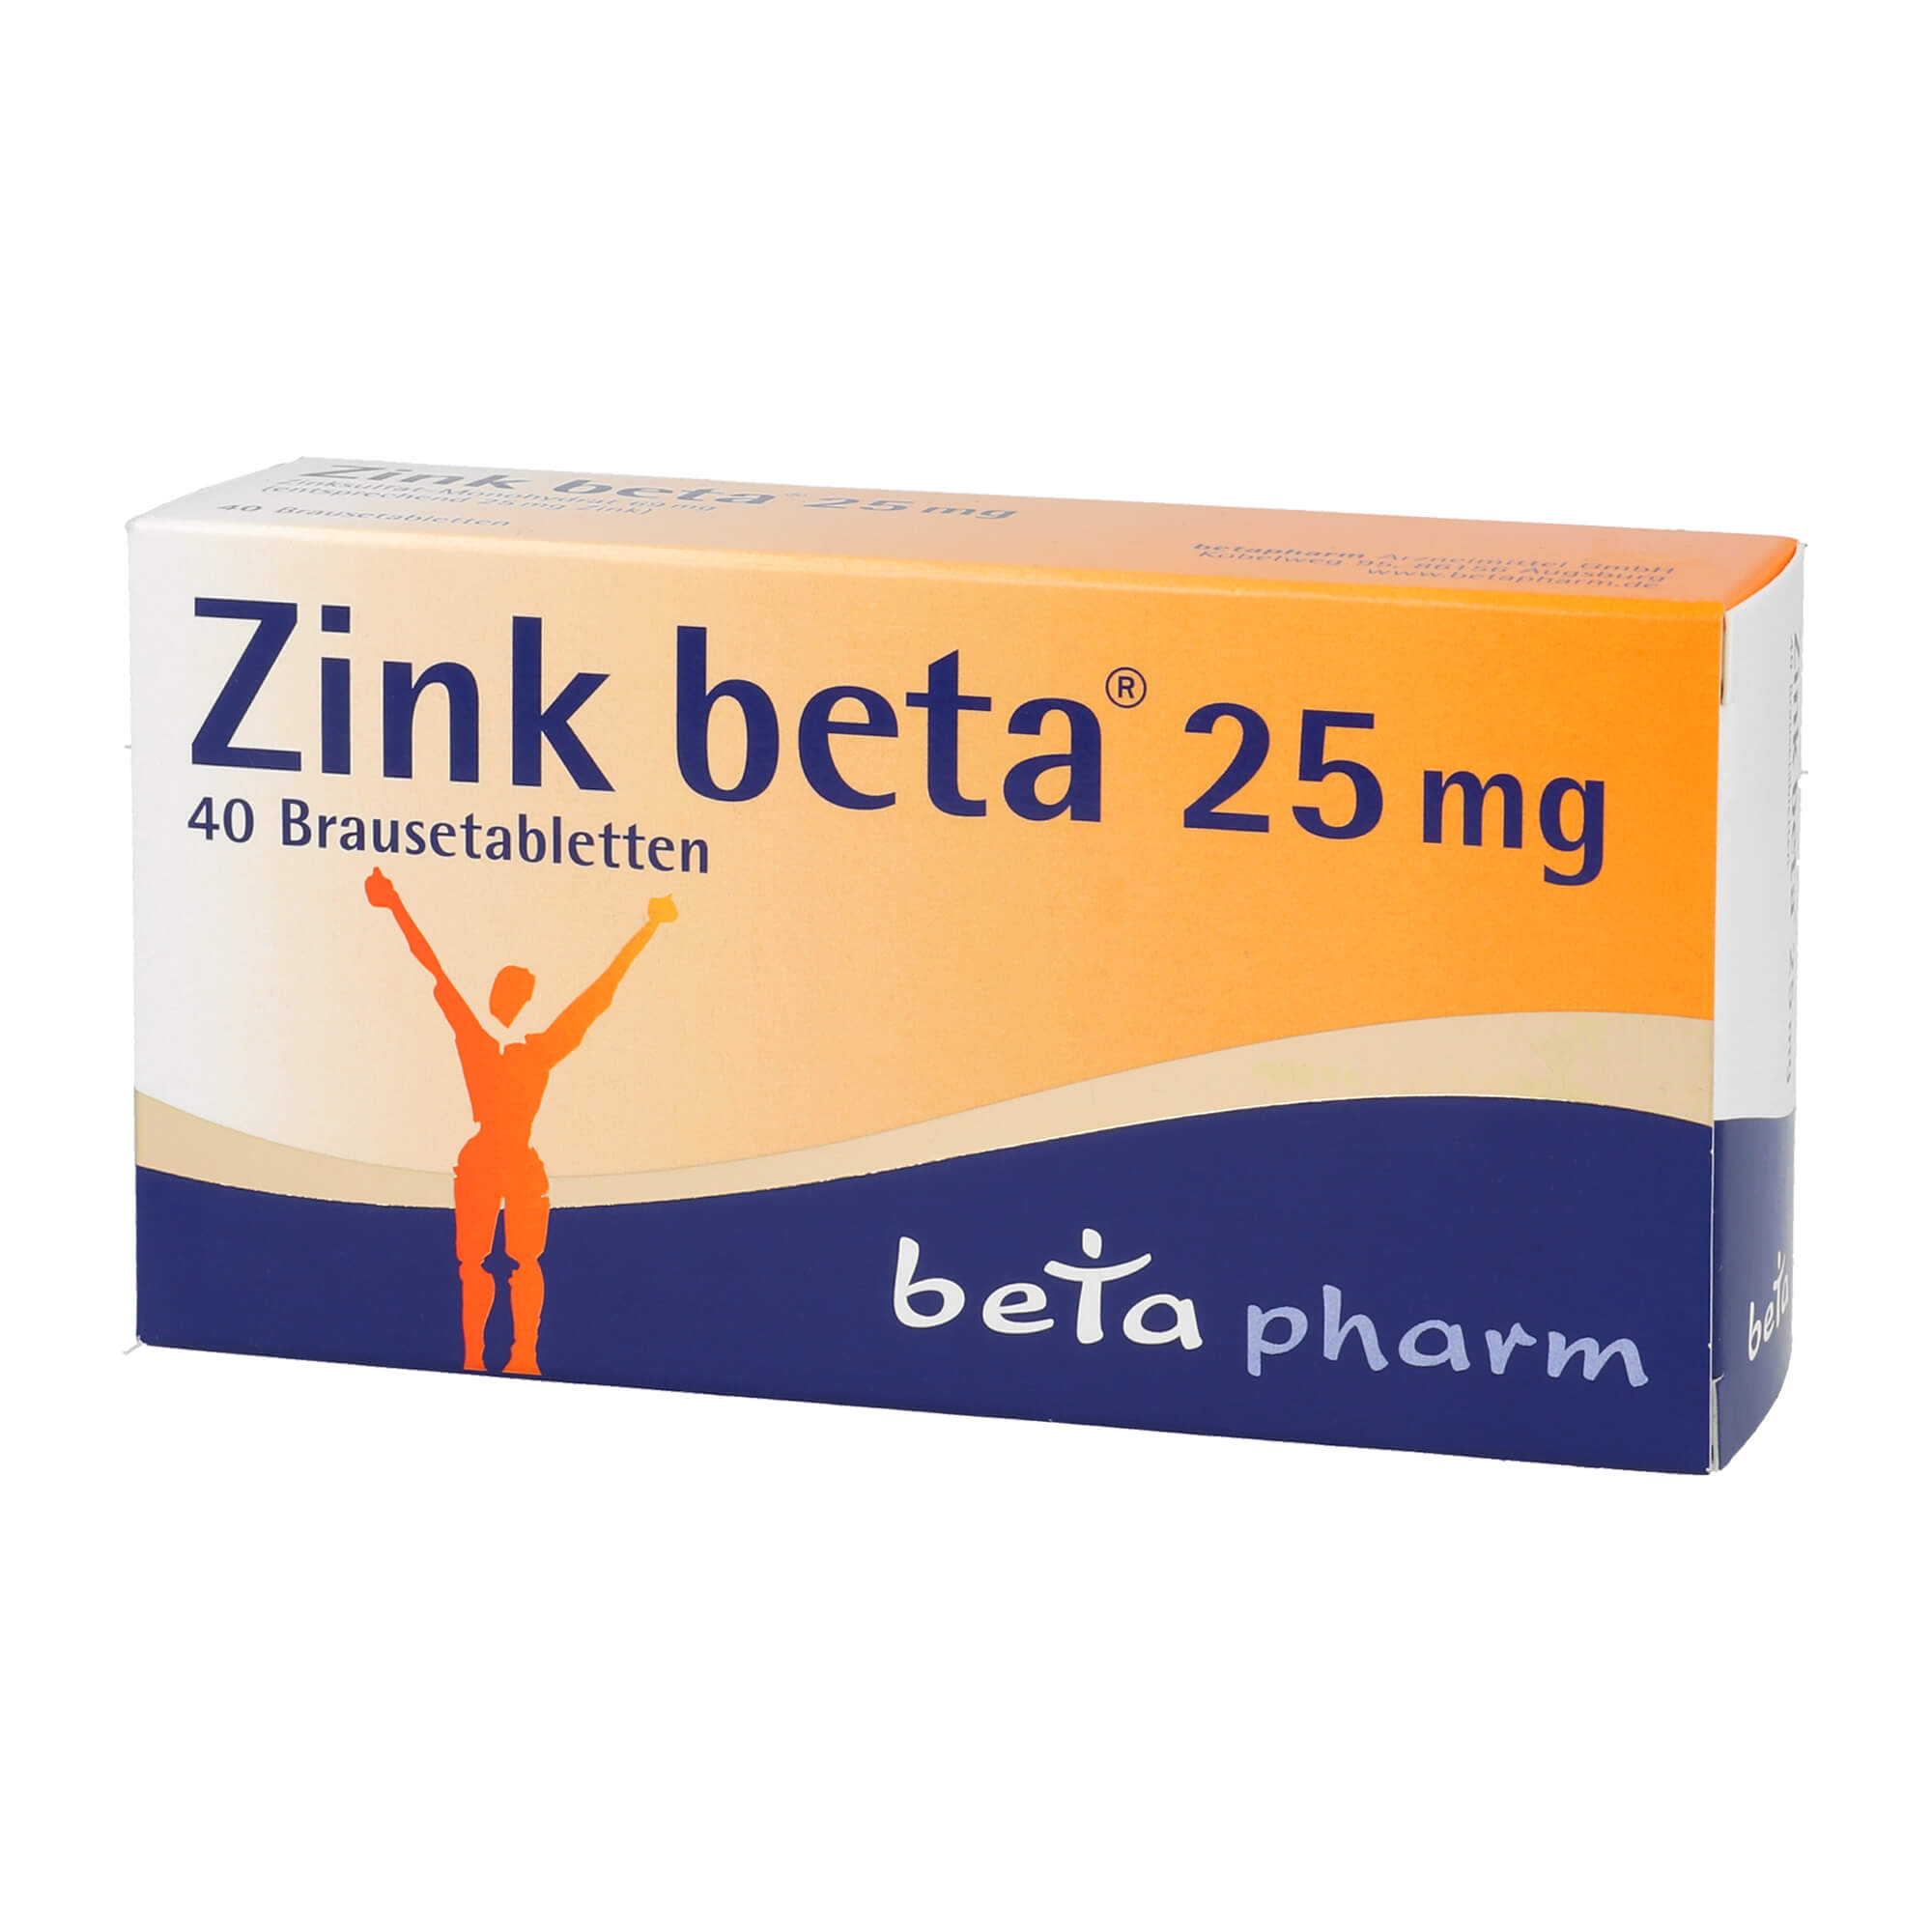 Zink beta 25 mg Brausetabletten